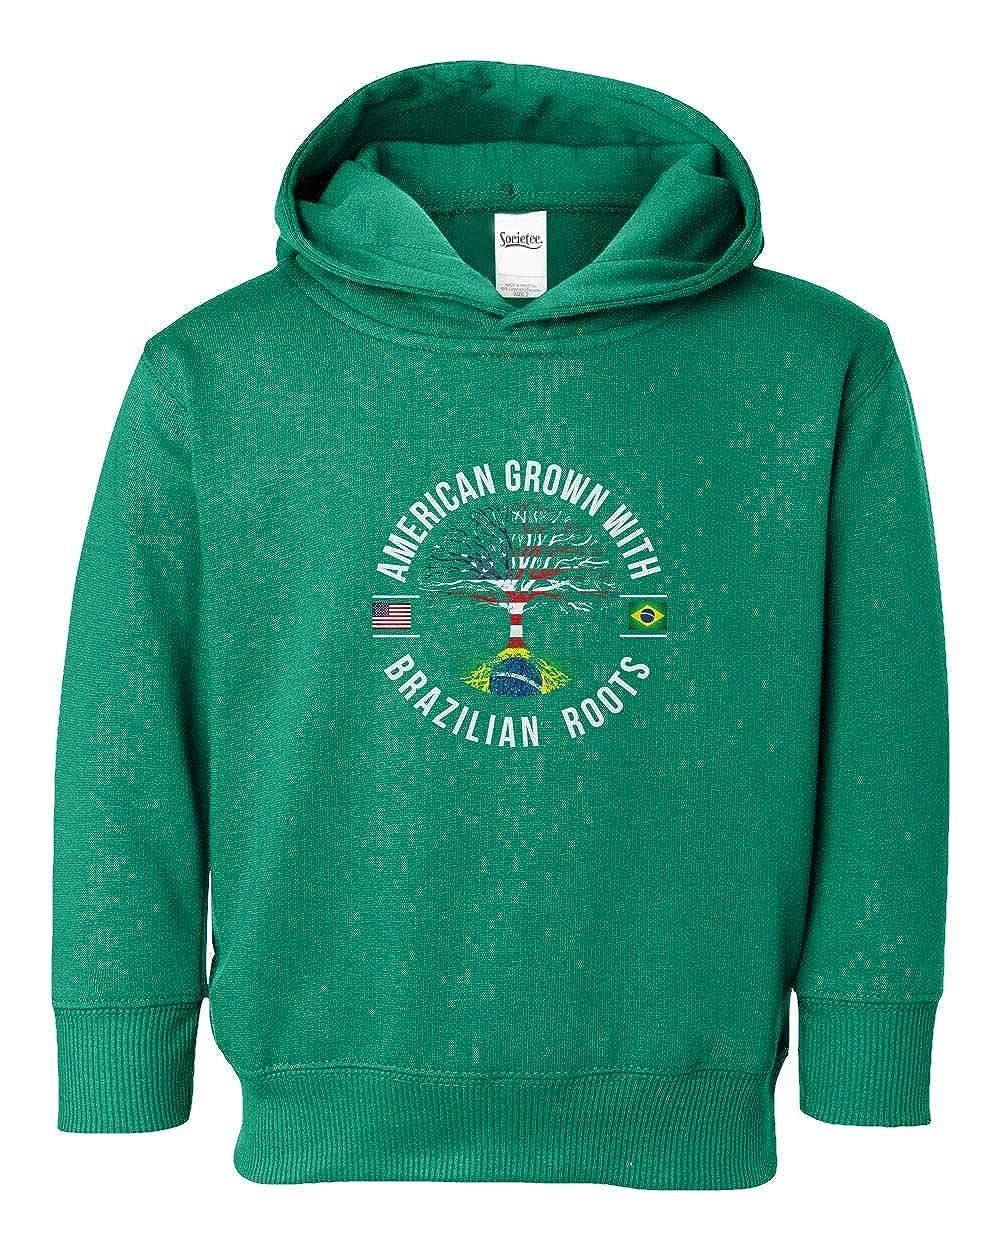 Societee American Grown with Brazilian Roots Youth /& Toddler Hoodie Sweatshirt